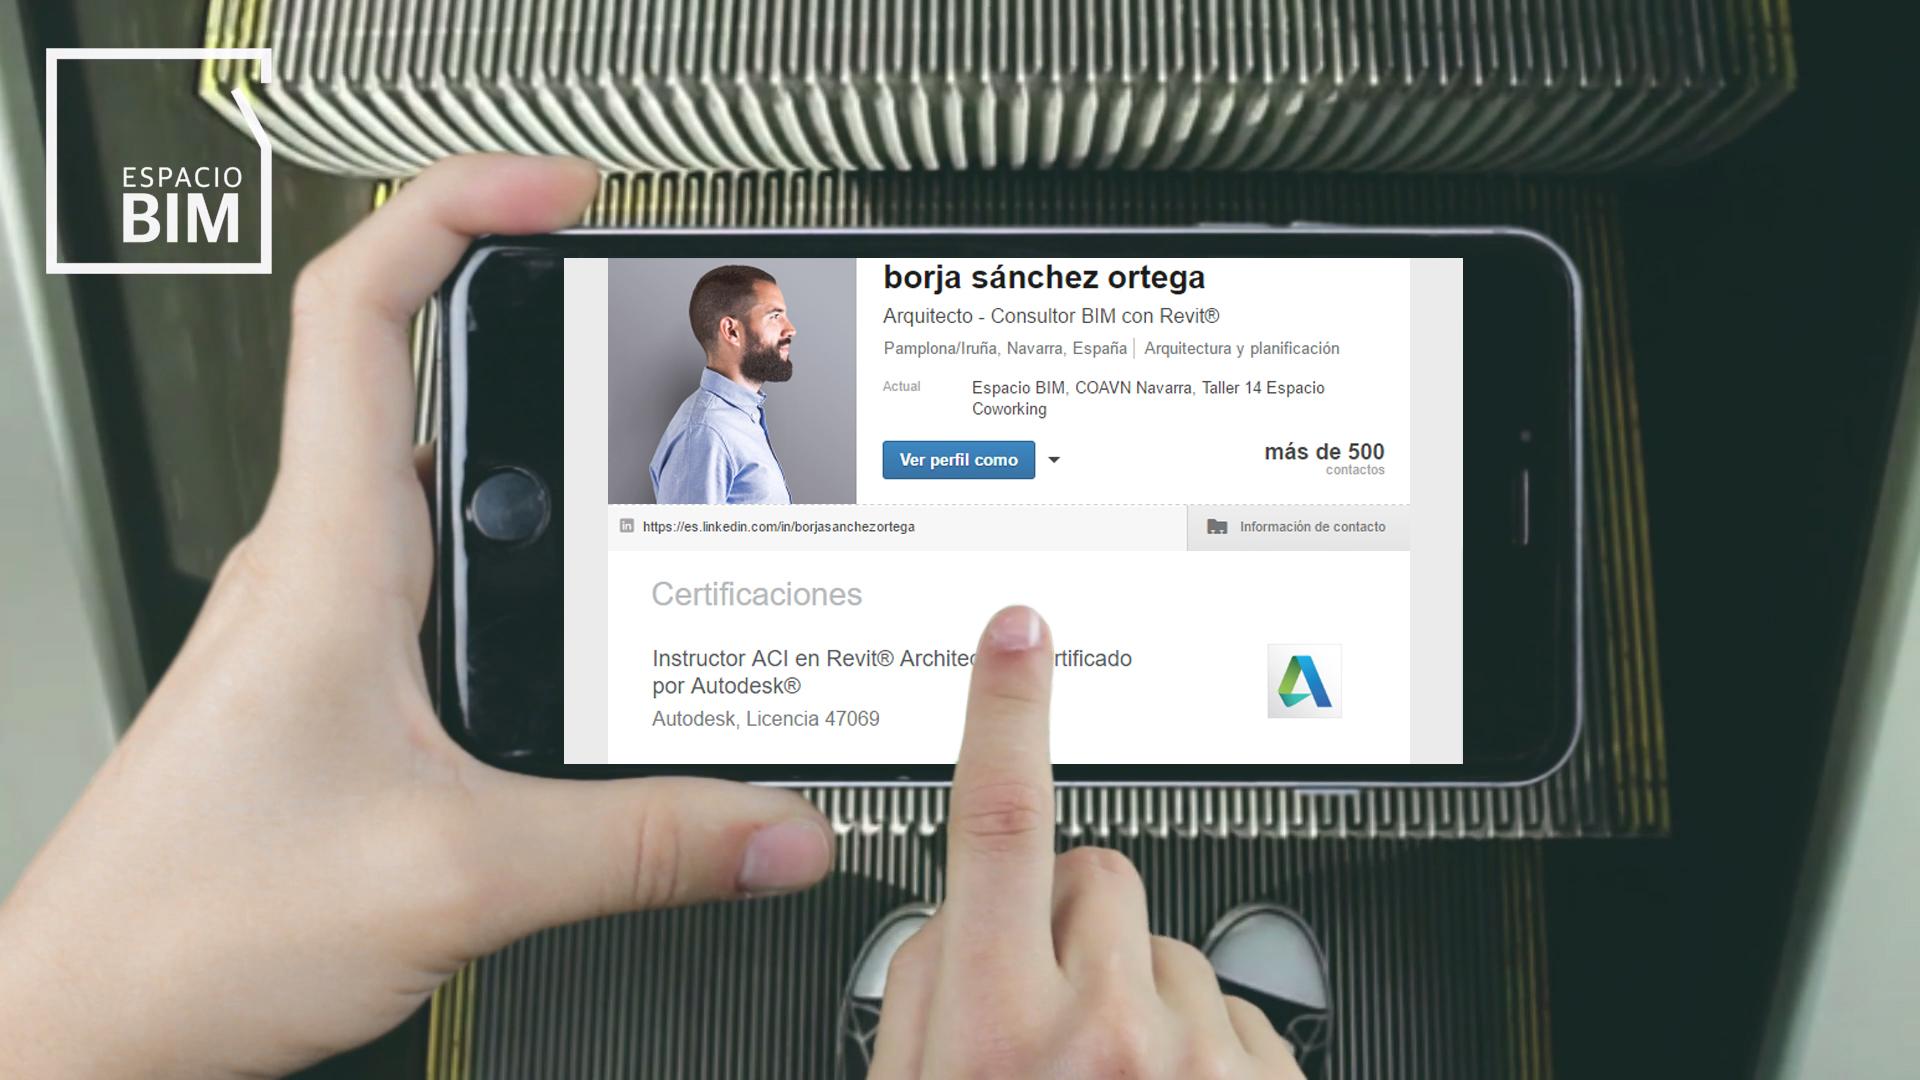 Certificacion Autodesk Revit en LinkedIn